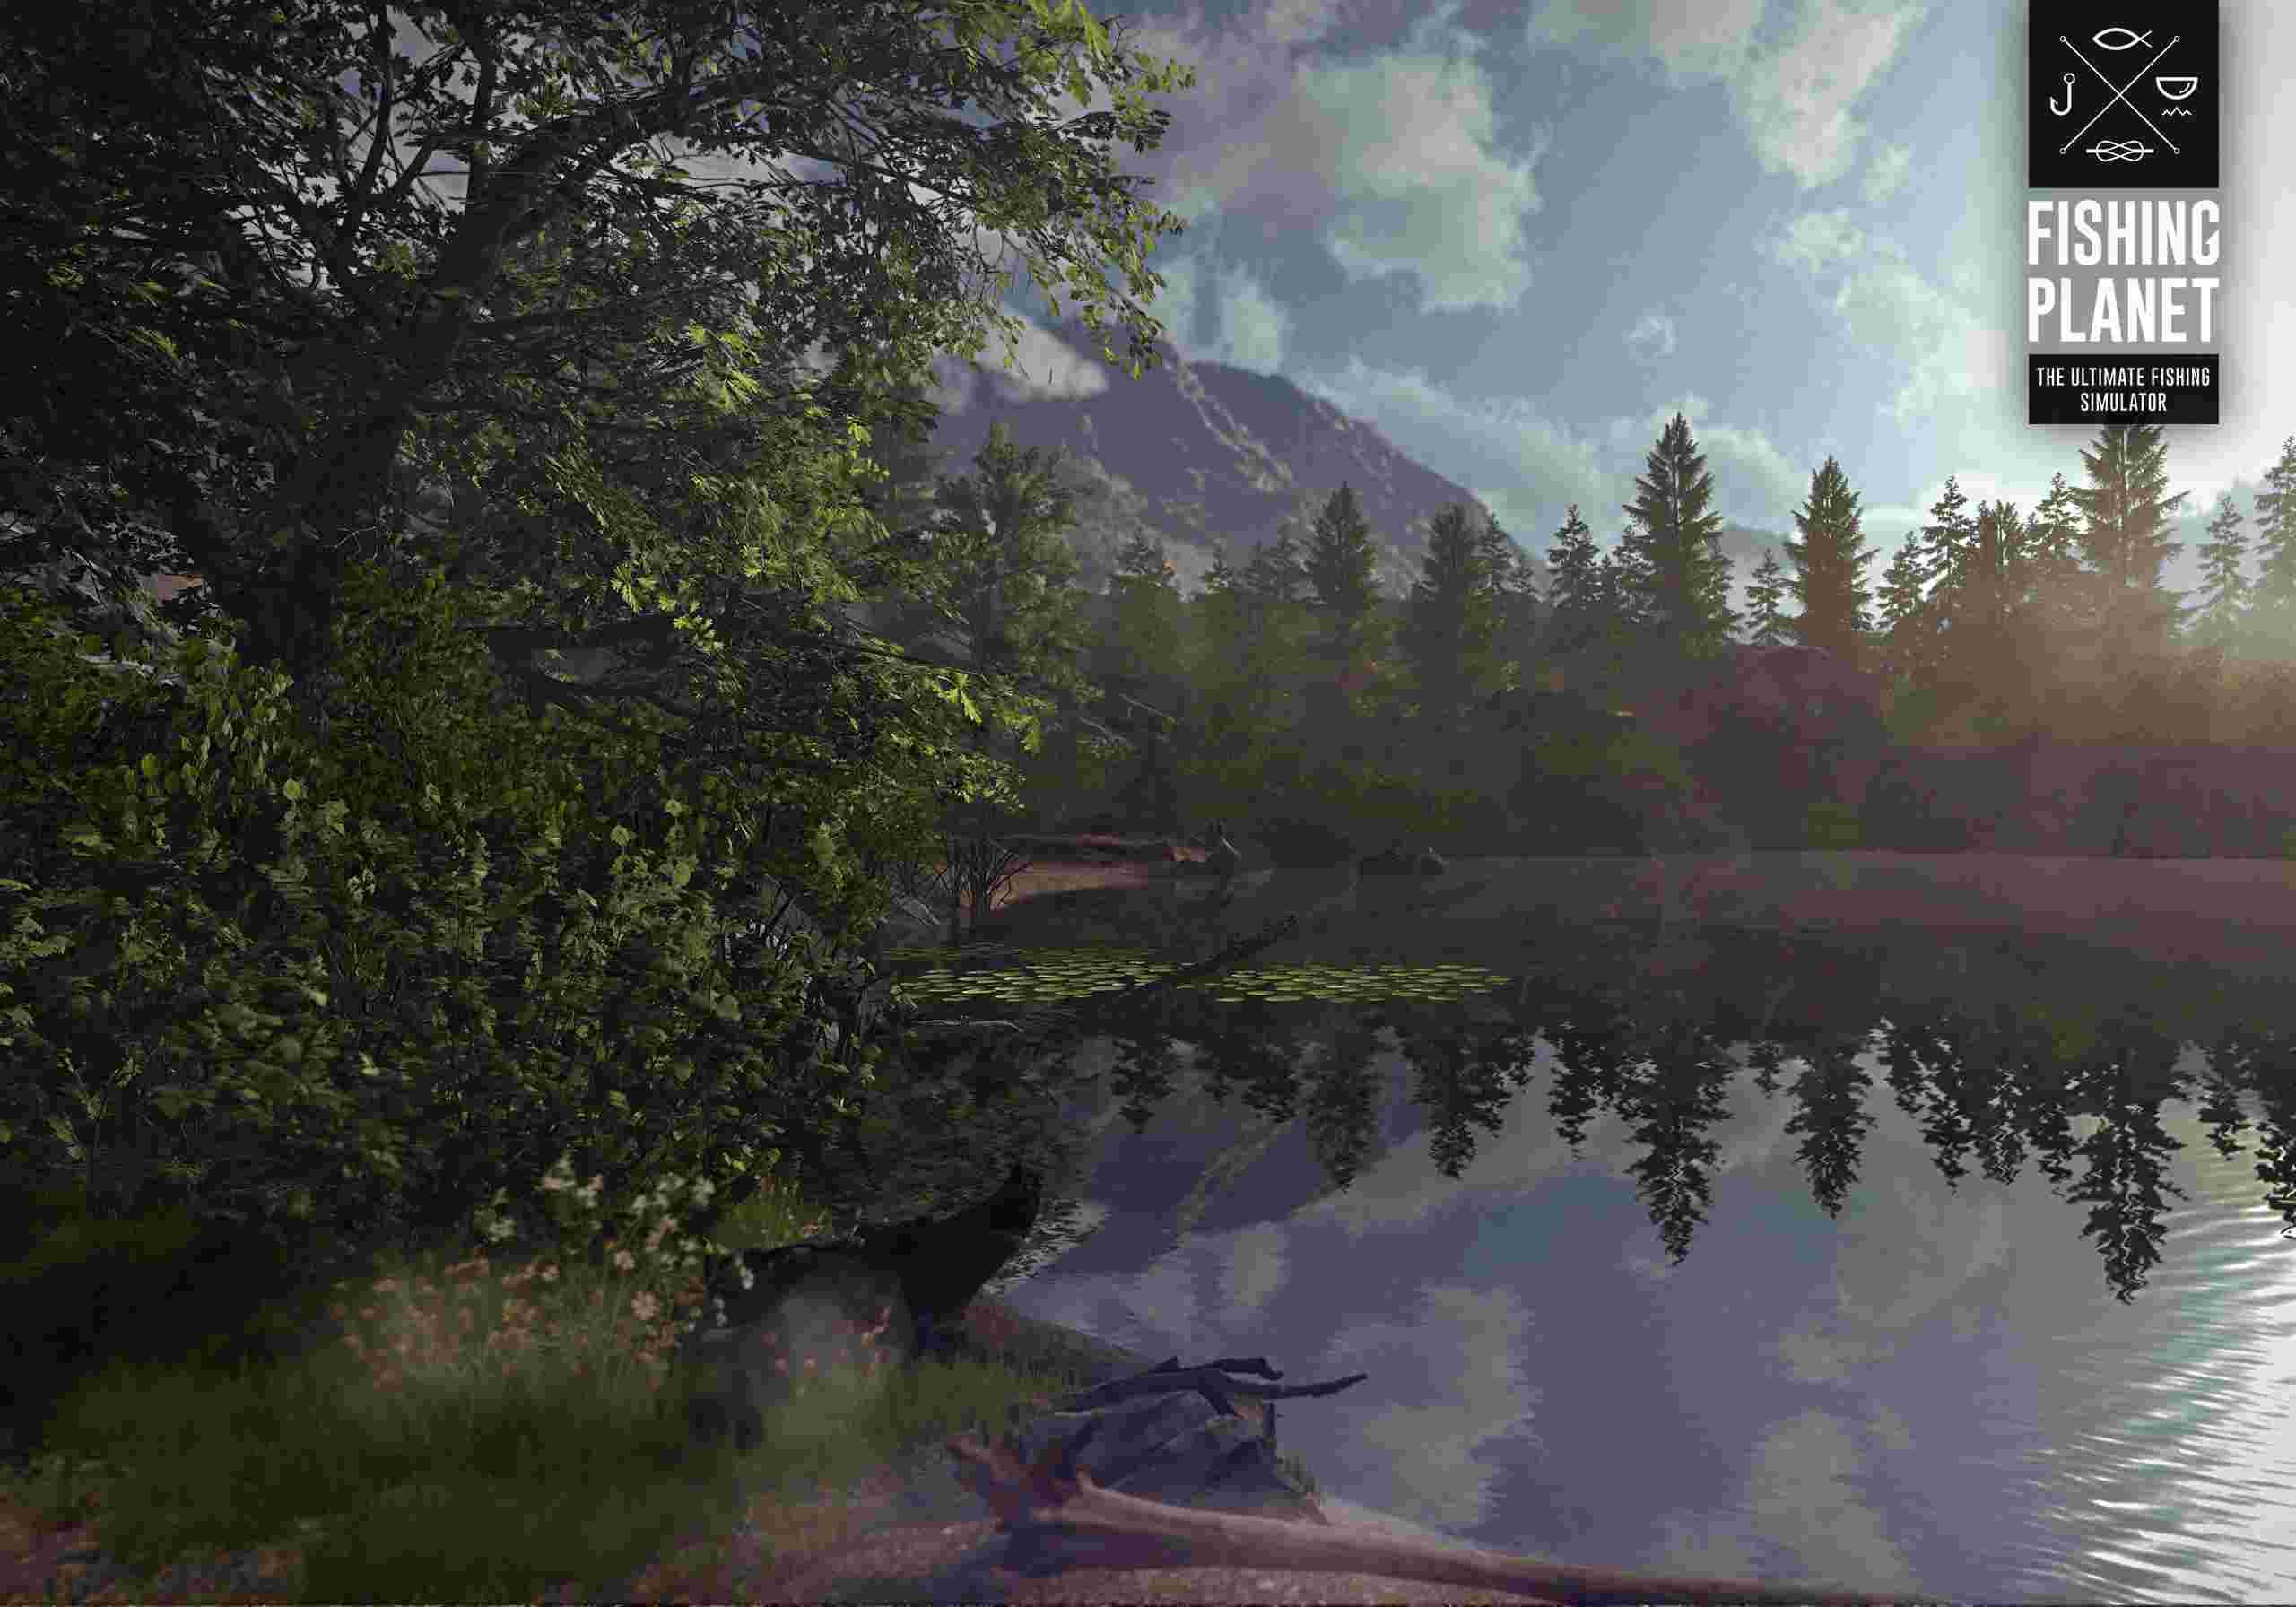 fishingplanet_rockylake